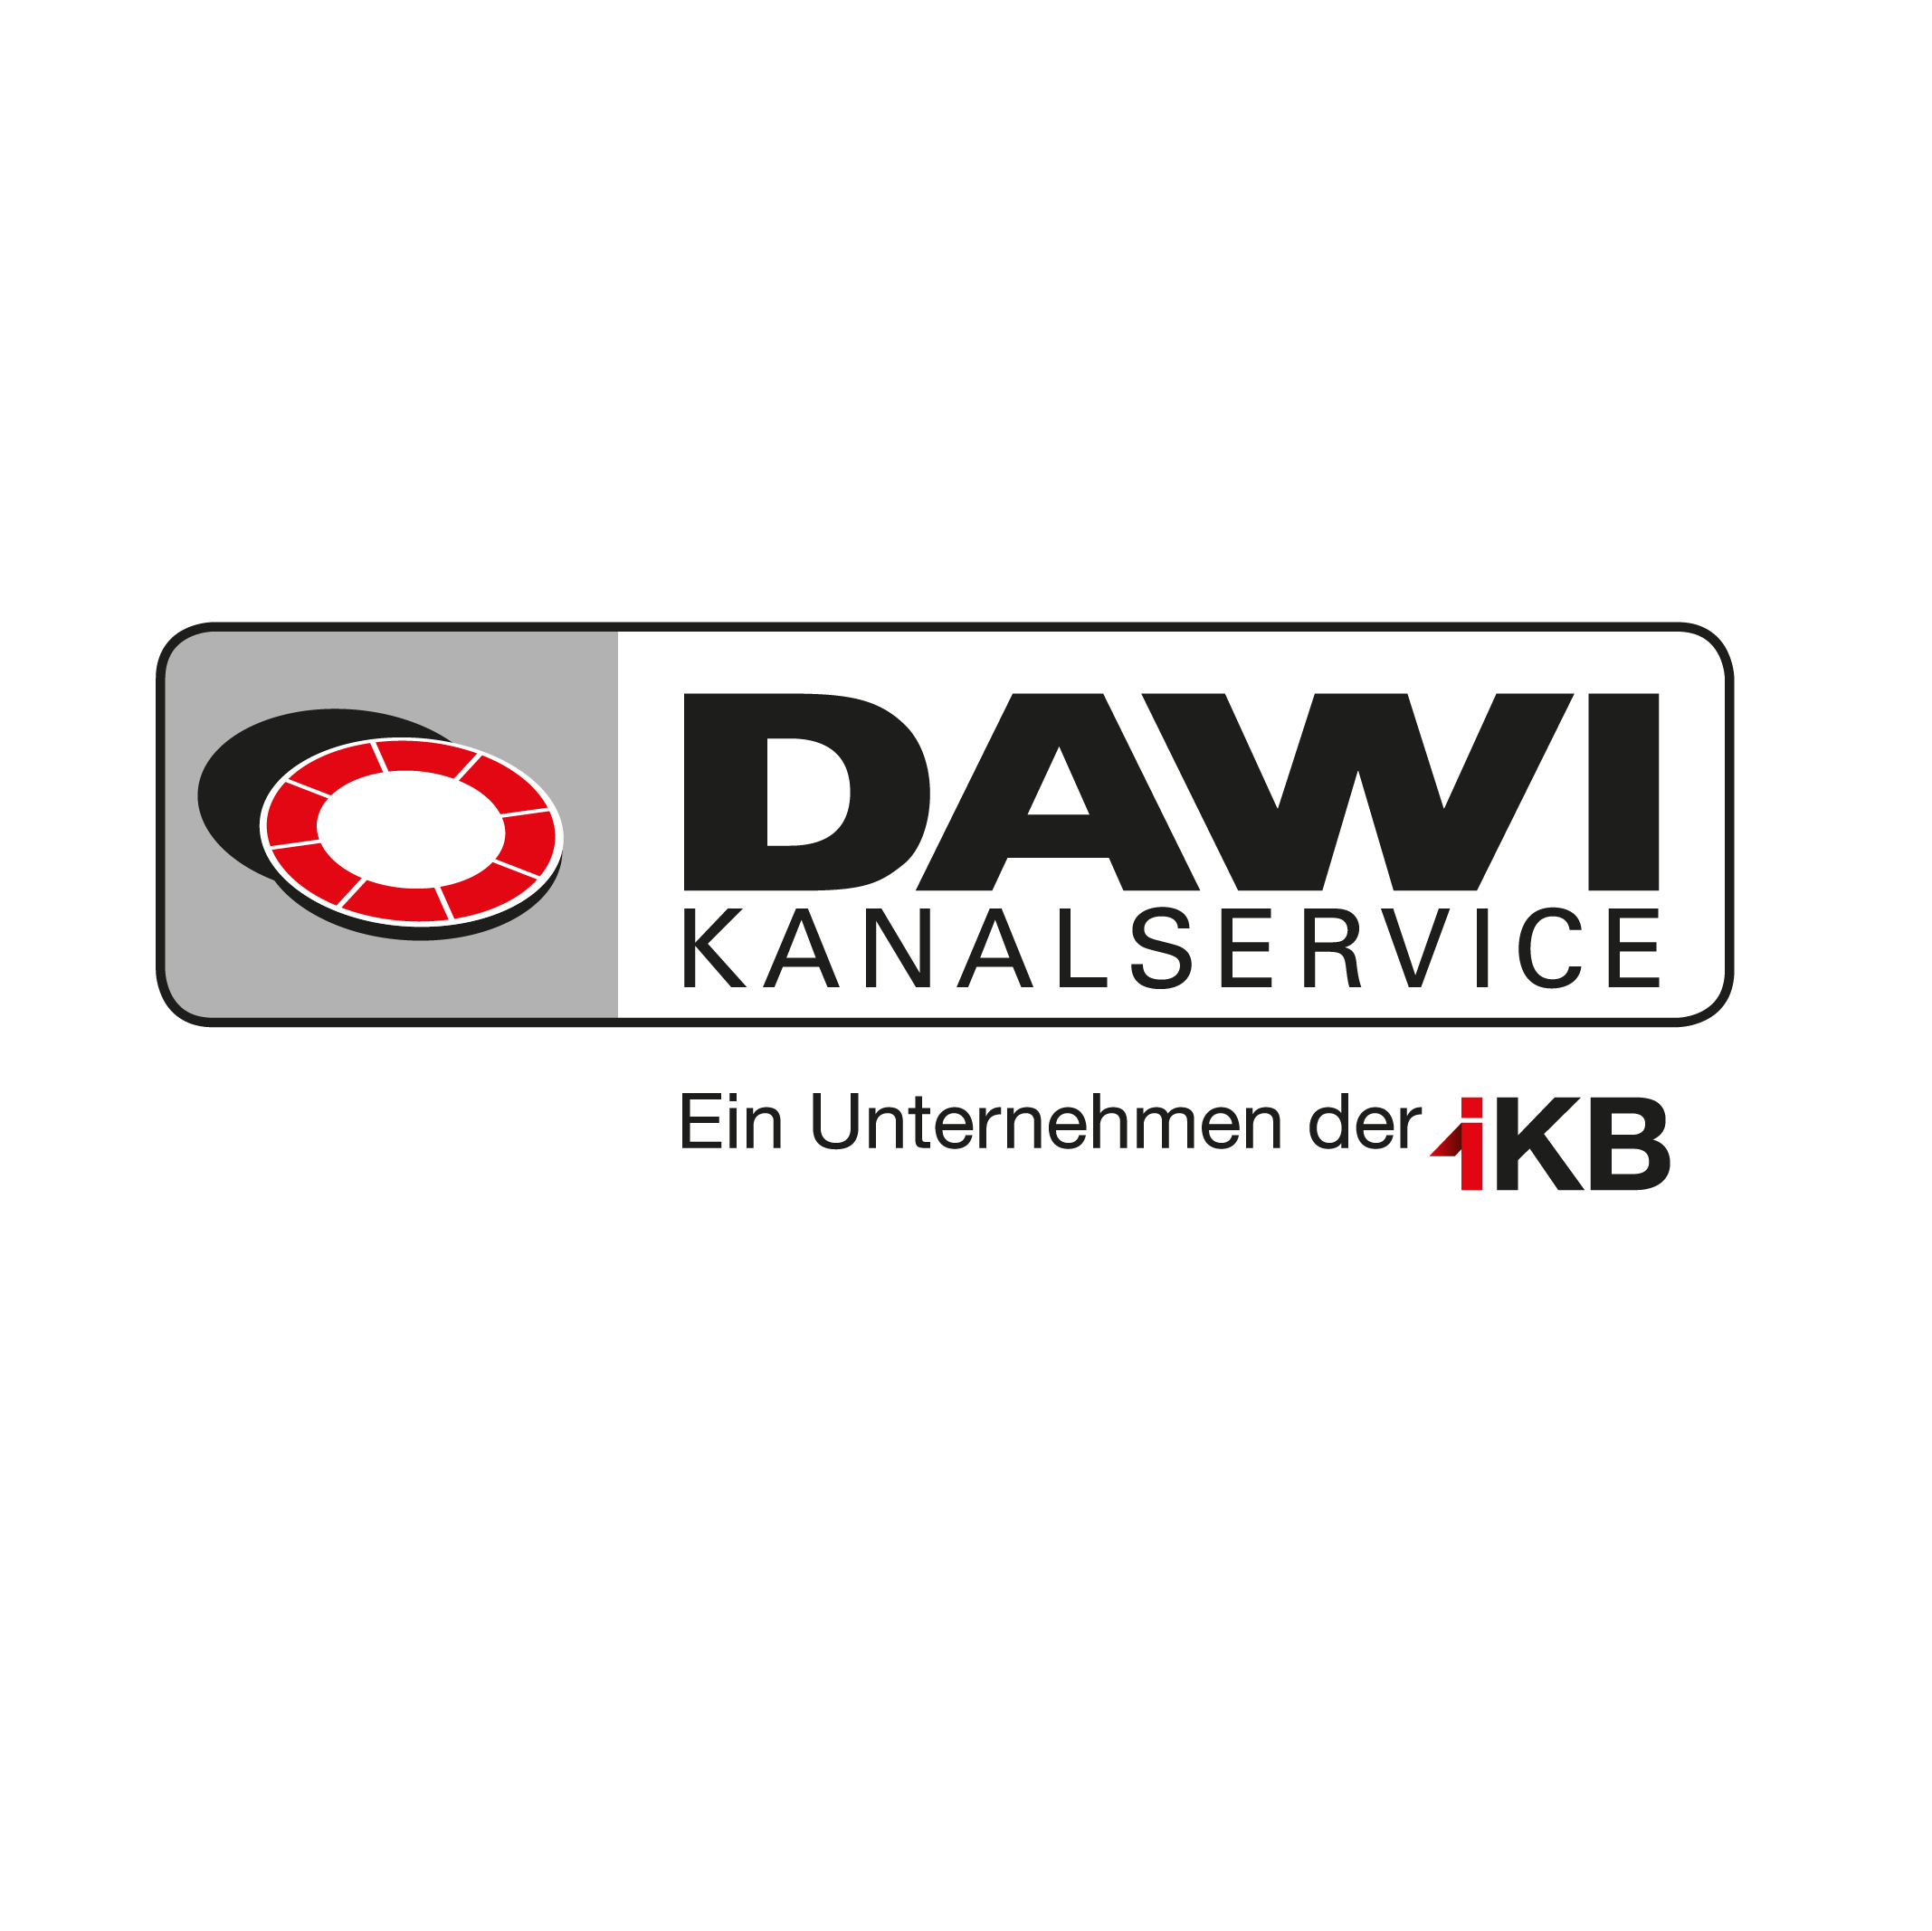 https://www.influxmediahouse.com/wp-content/uploads/2019/01/Logo_DAWI-colour.png